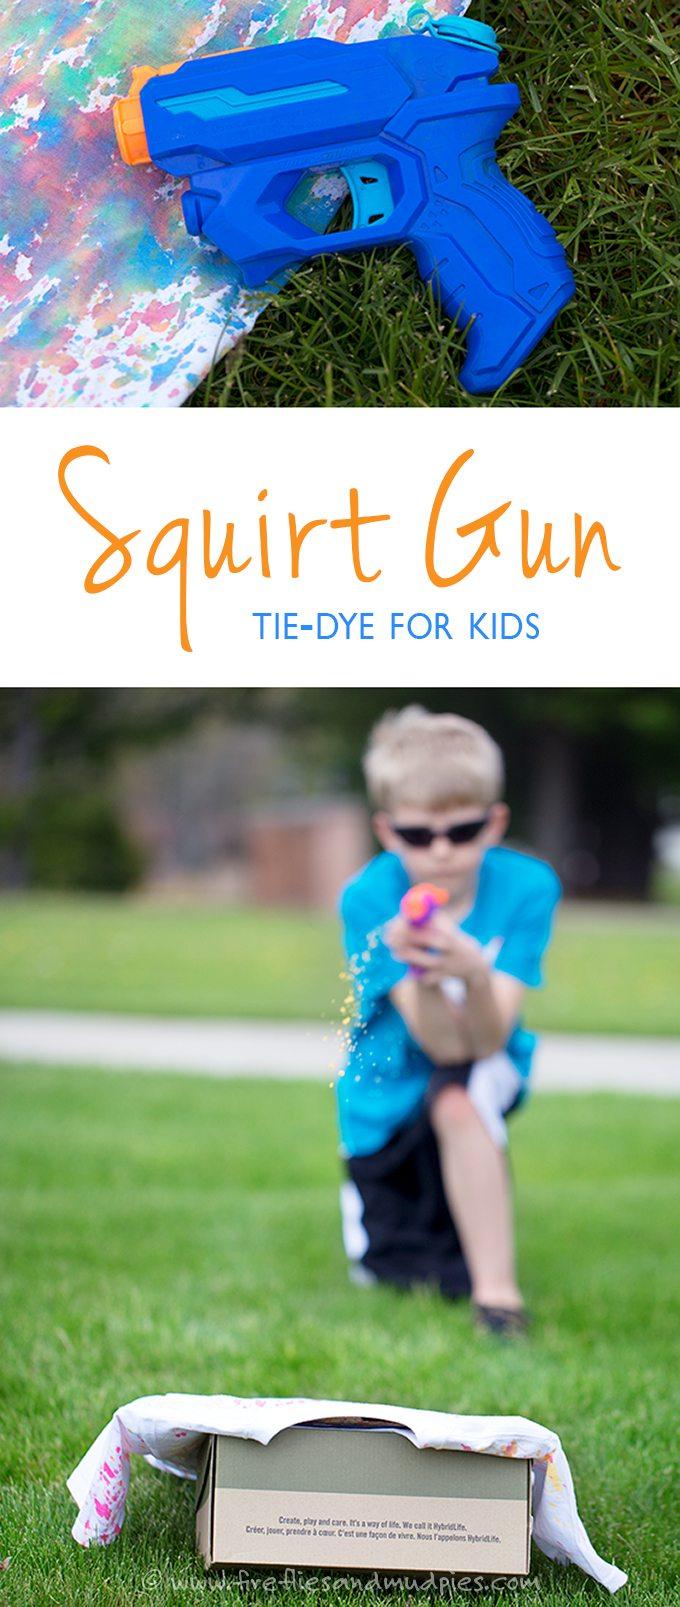 Squirt gun tie-die is awesome summer fun for kids!